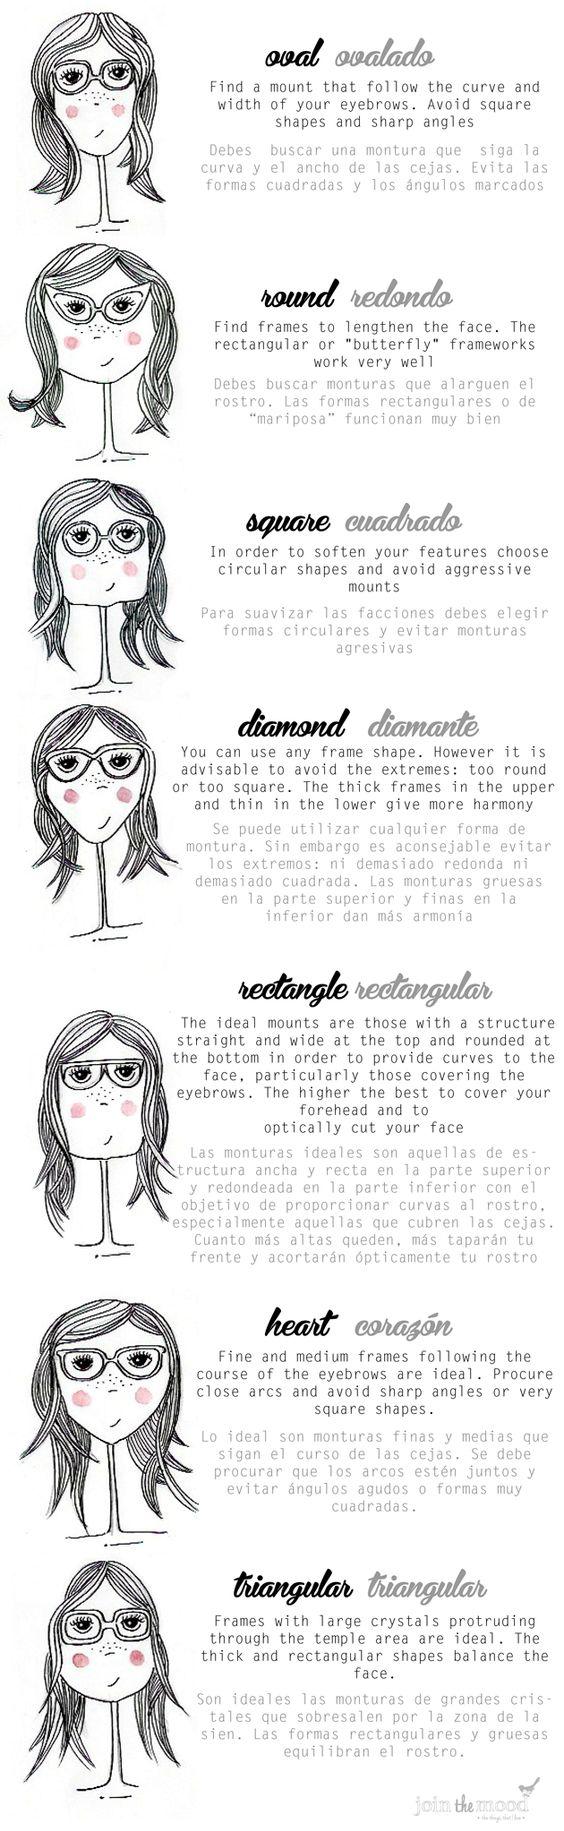 Tipos de rostro: Face Well, Form, Face Shapes, Shape Glasses, Eyeglass Shapes, Gafas Usar, Eyeglass, The Shape, Shapes I Ll